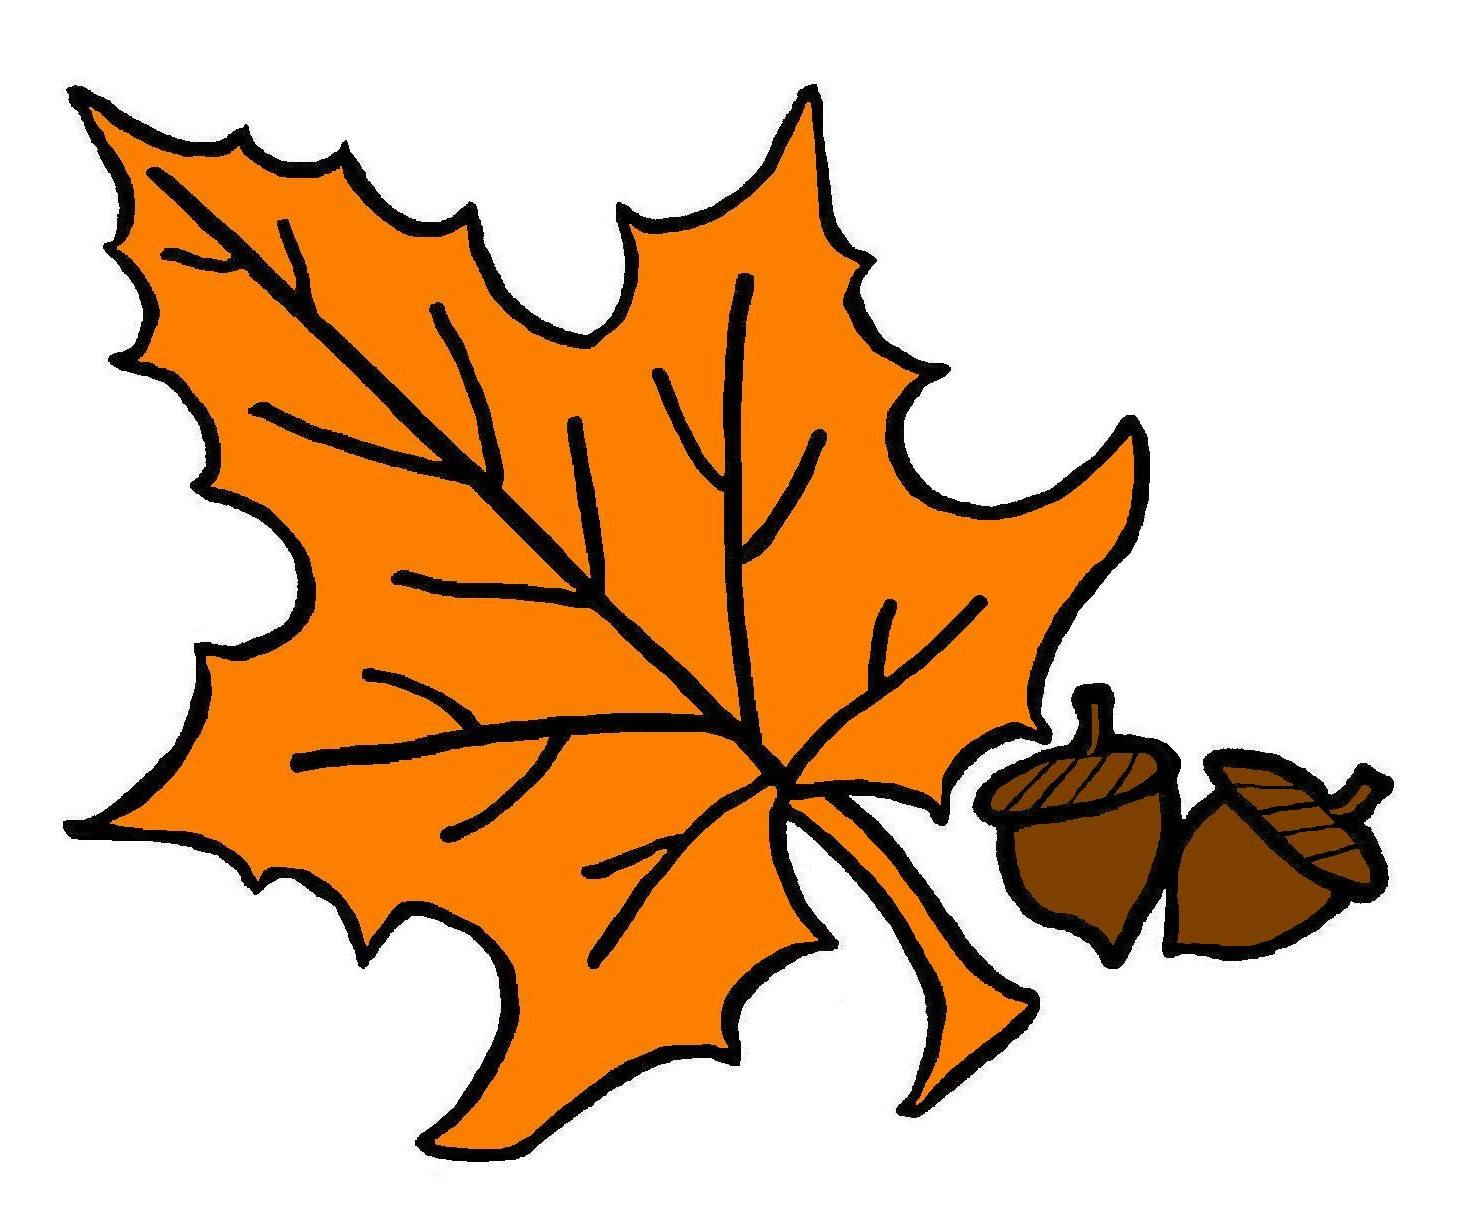 Tree clipart autumn leaves #12